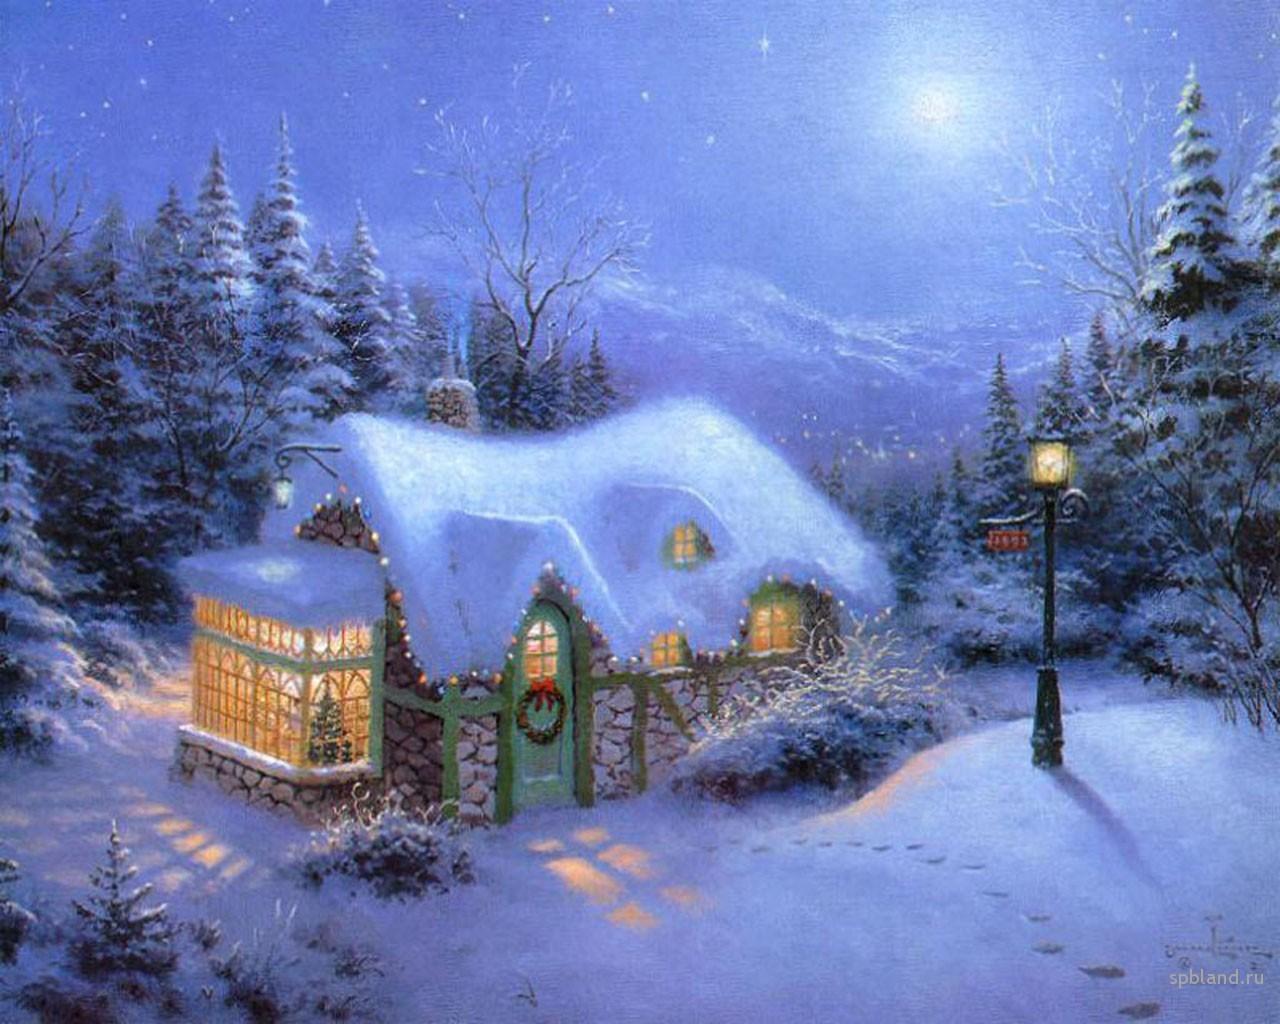 as desktop background desktop wallpapers holidays christmas wallpapers 1280x1024